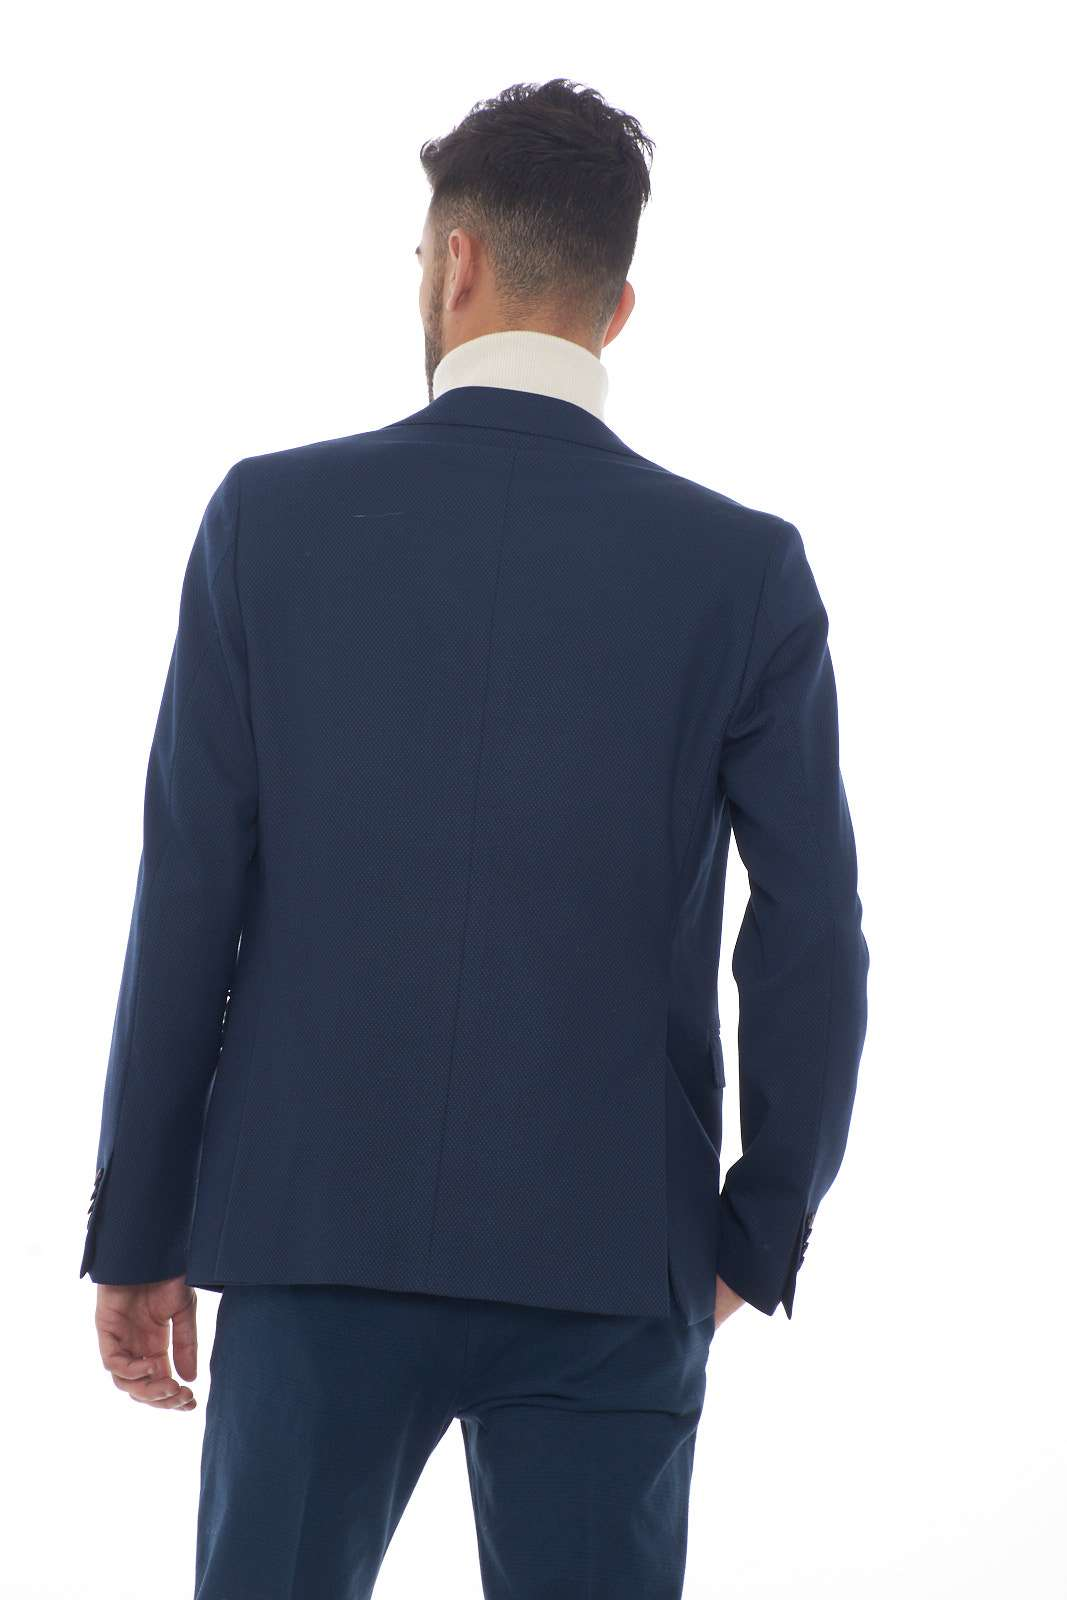 https://www.parmax.com/media/catalog/product/a/i/AI-outlet_parmax-giacca-uomo-Manuel-Ritz-2732G2068%20193534-C.jpg